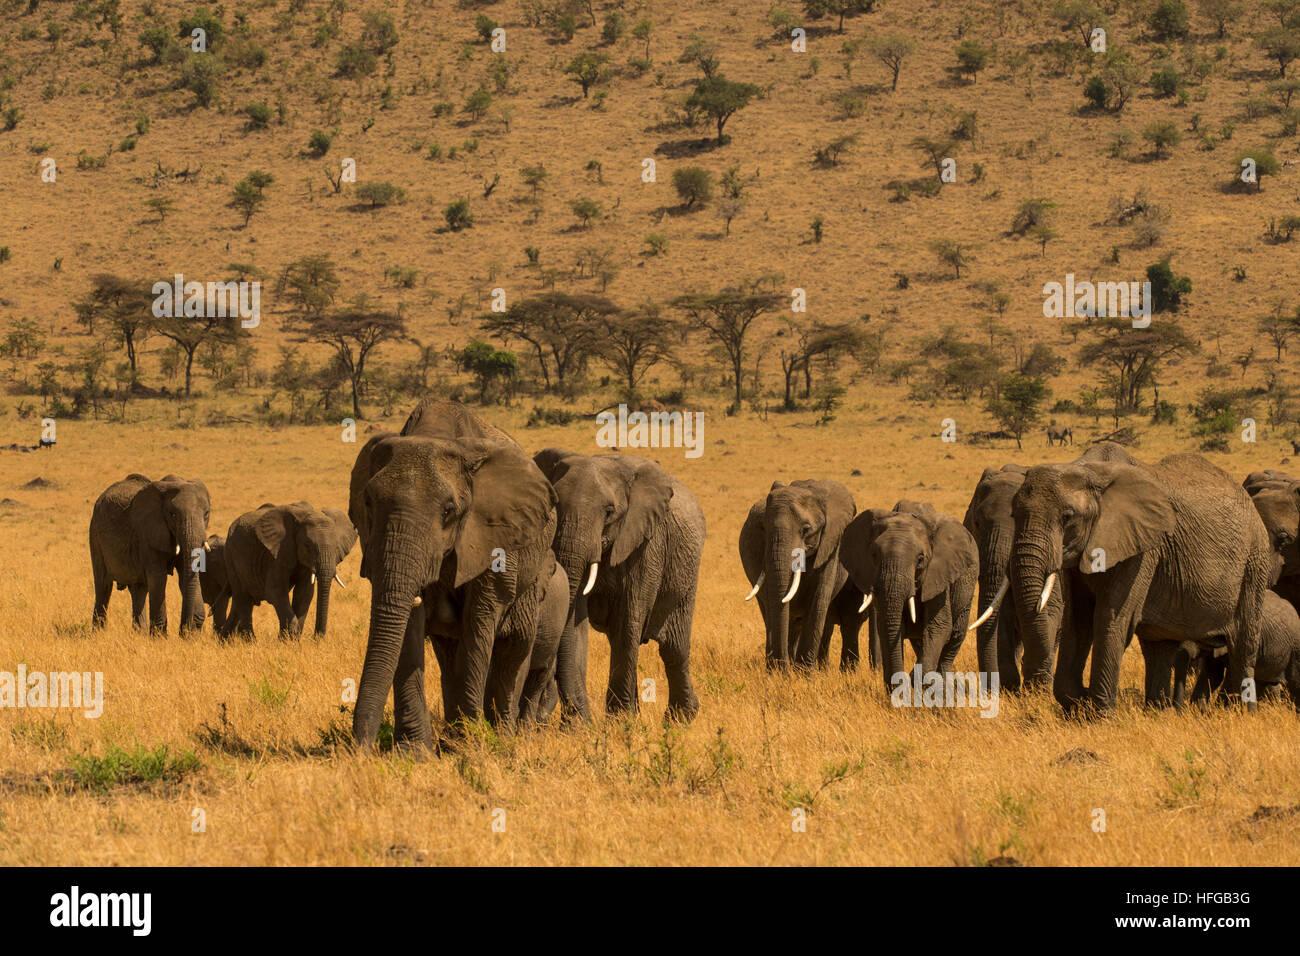 Elephant herd walking with young - Stock Image